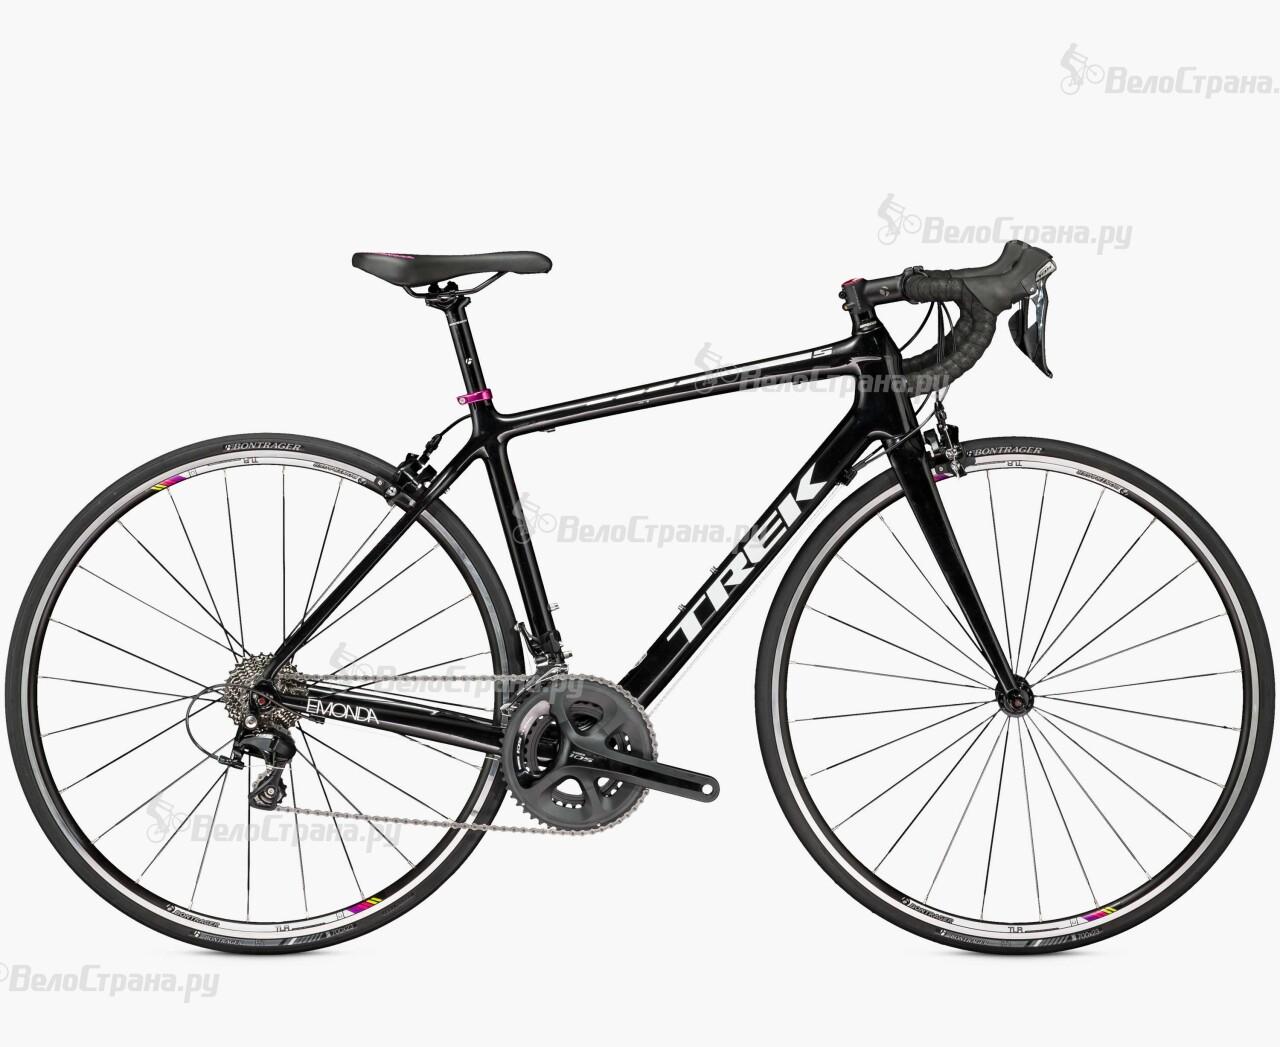 Велосипед Trek Émonda S 5 WSD (2016) велосипед trek madone 3 1 wsd 2013